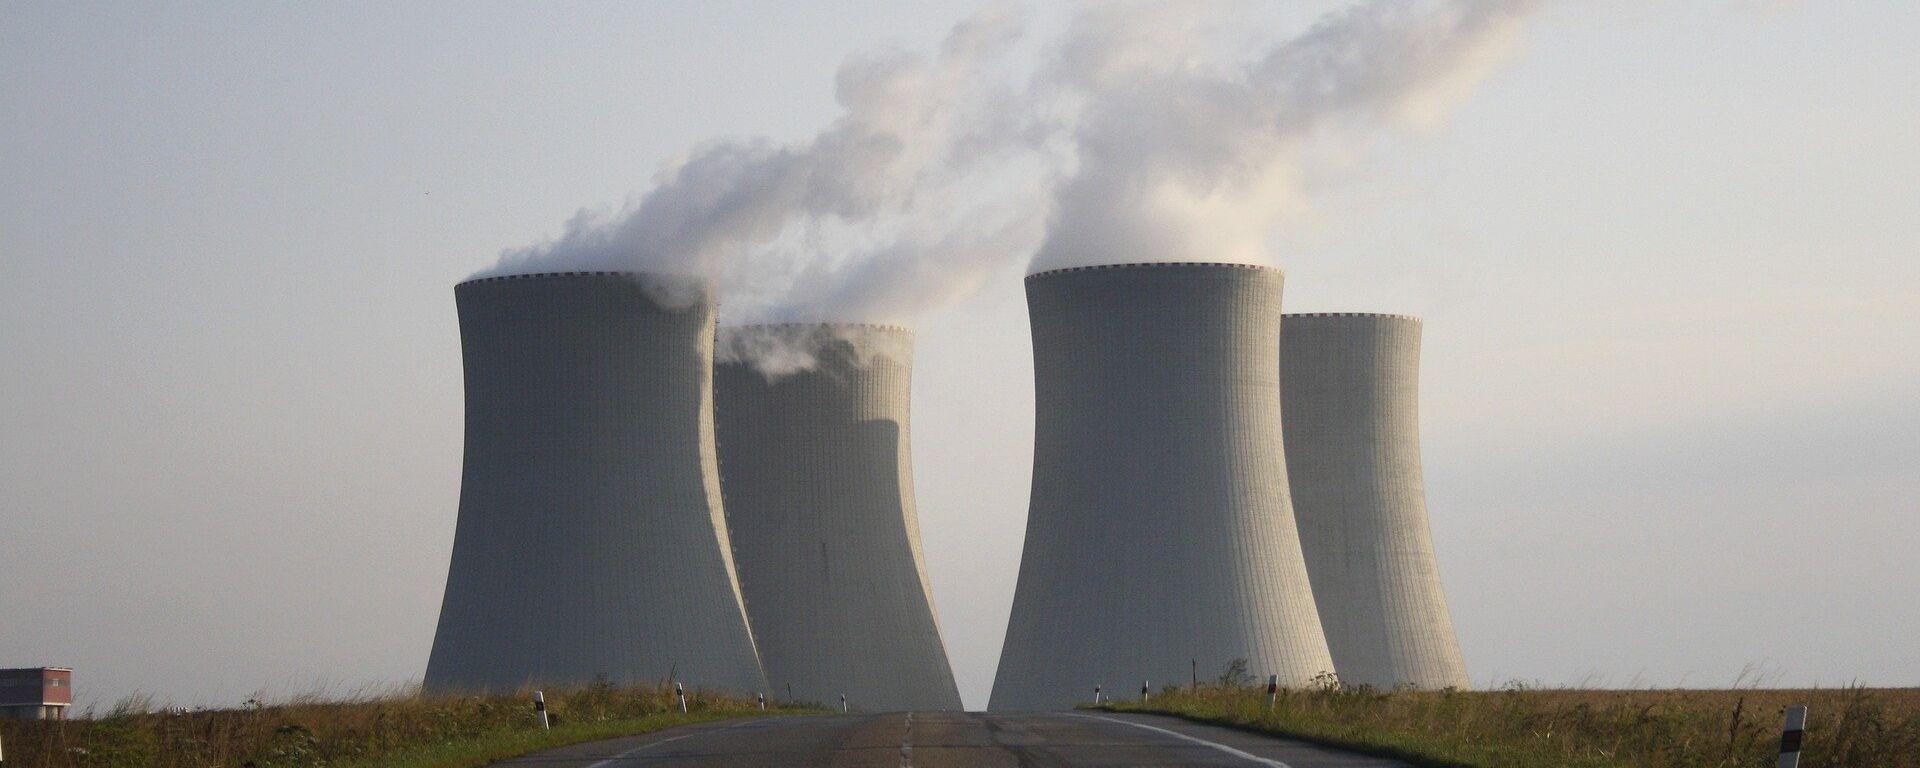 Planta nuclear - Sputnik Mundo, 1920, 12.04.2021